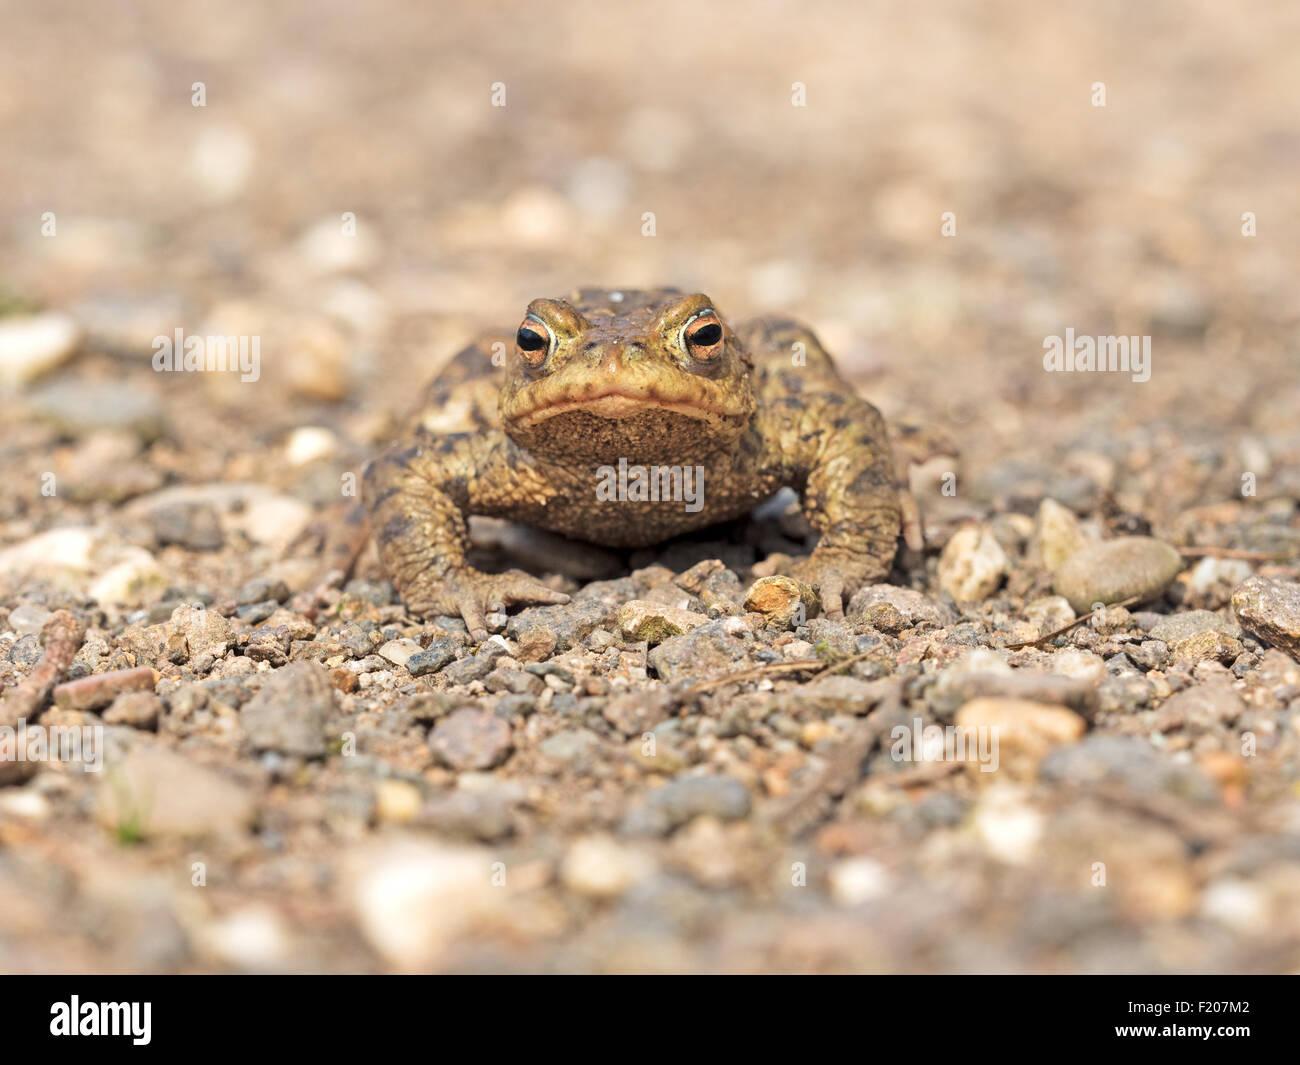 Erdkröte auf Kiesweg Stock Photo